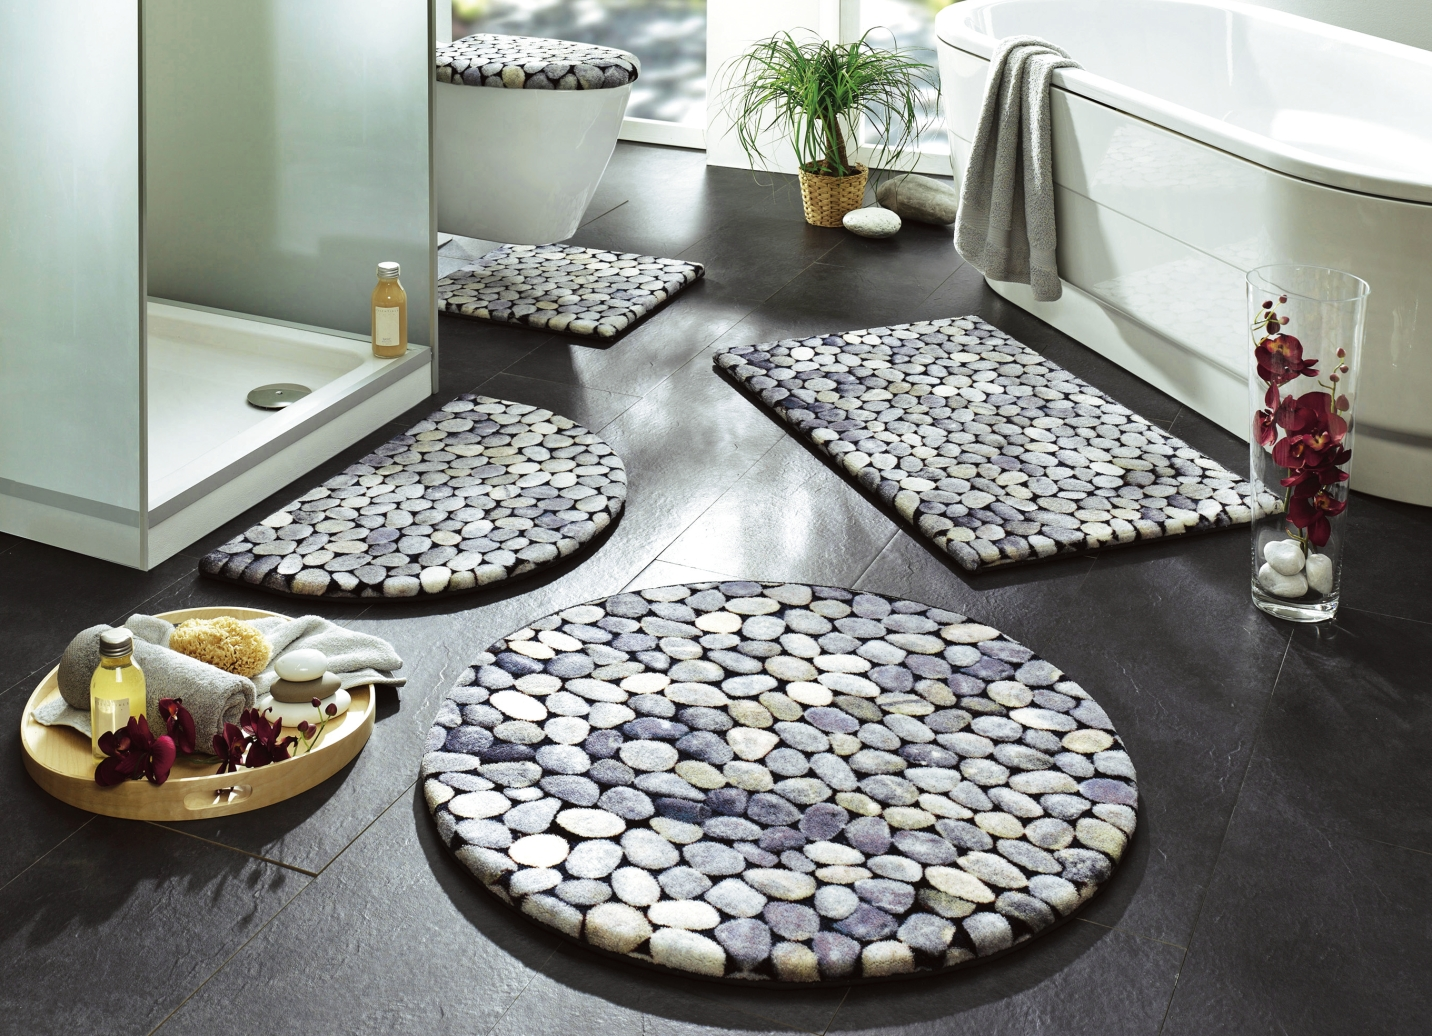 badgarnitur mit kieselstein motiv badgarnituren bader. Black Bedroom Furniture Sets. Home Design Ideas